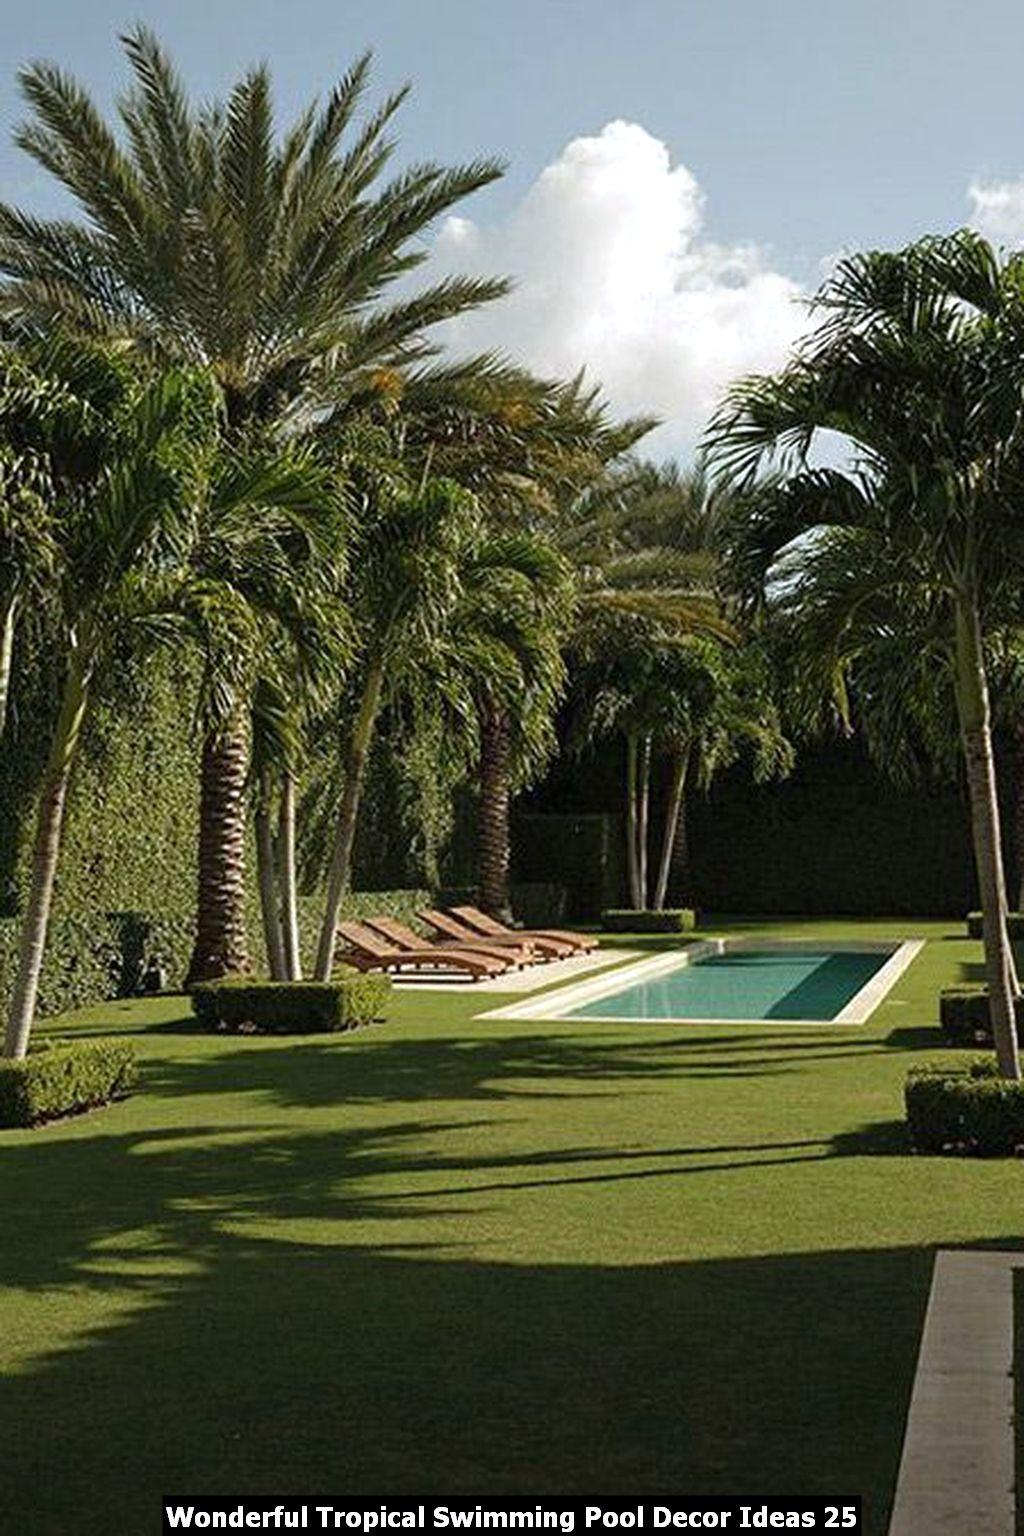 Wonderful Tropical Swimming Pool Decor Ideas 25